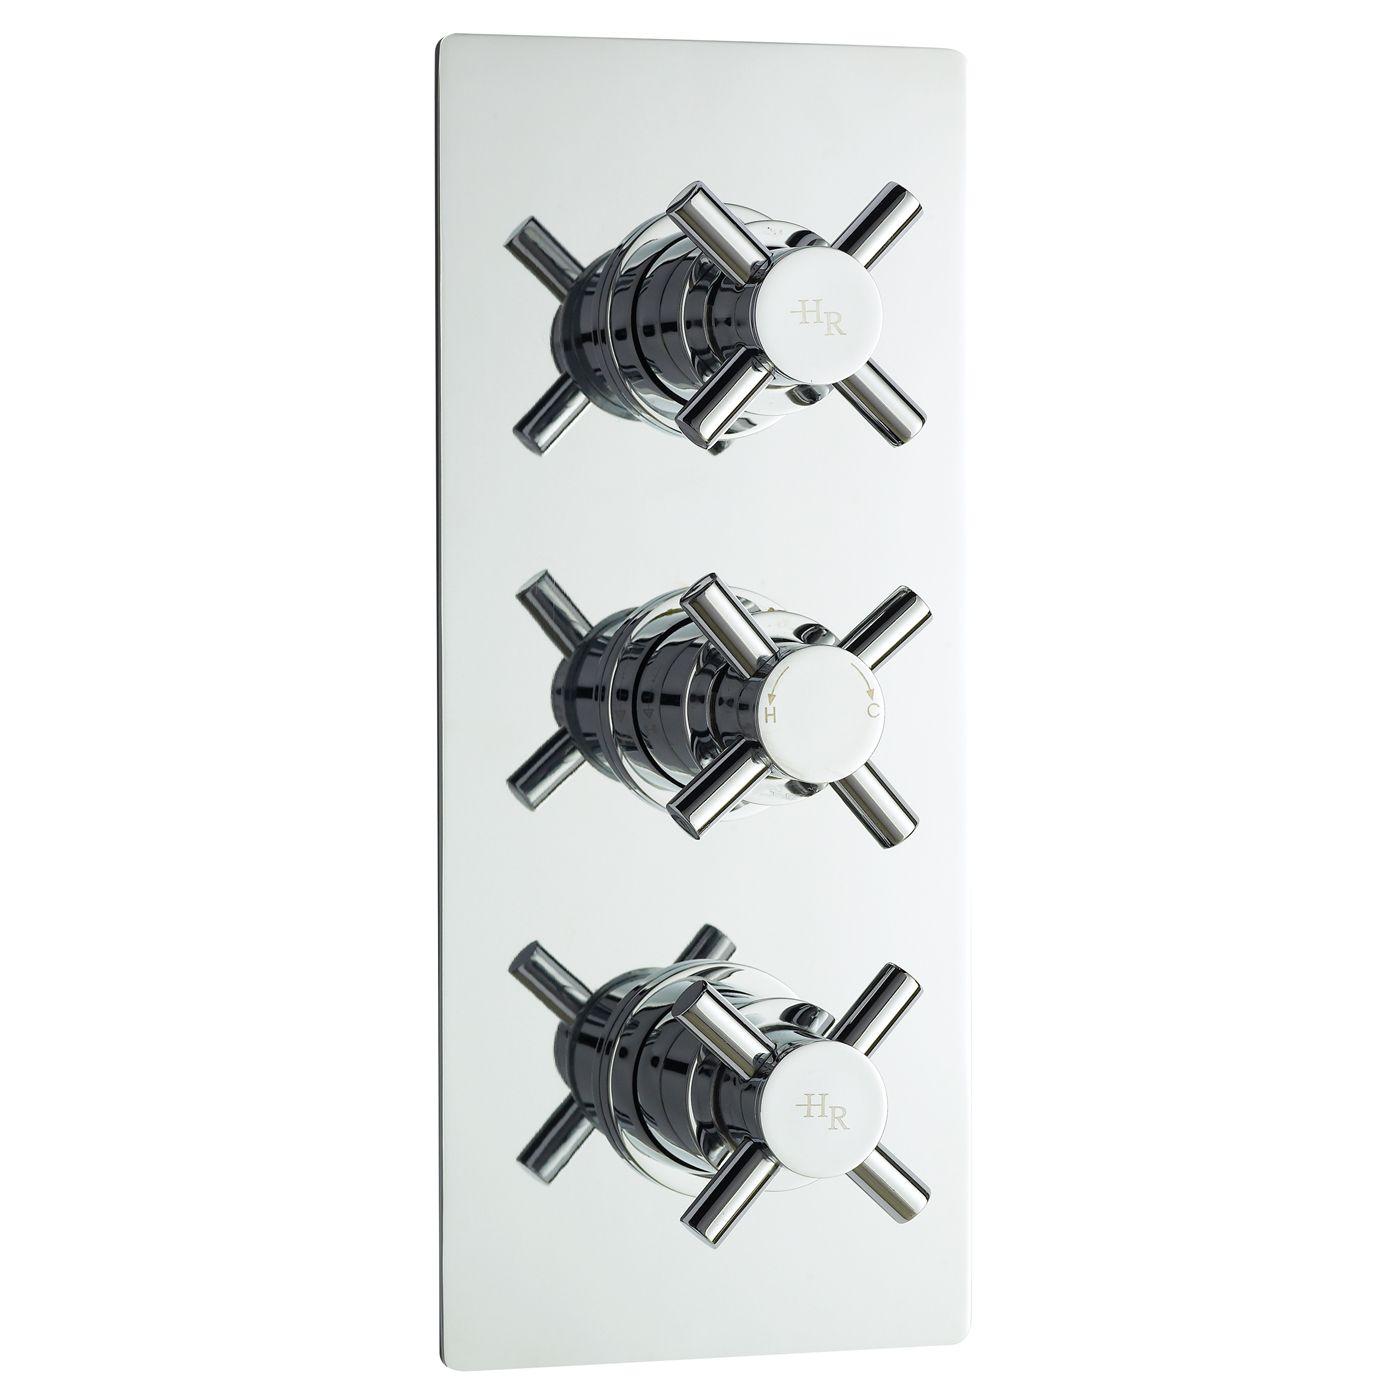 Kristal Concealed Thermostatic Triple Shower Valve with Diverter 3 Outlet Options